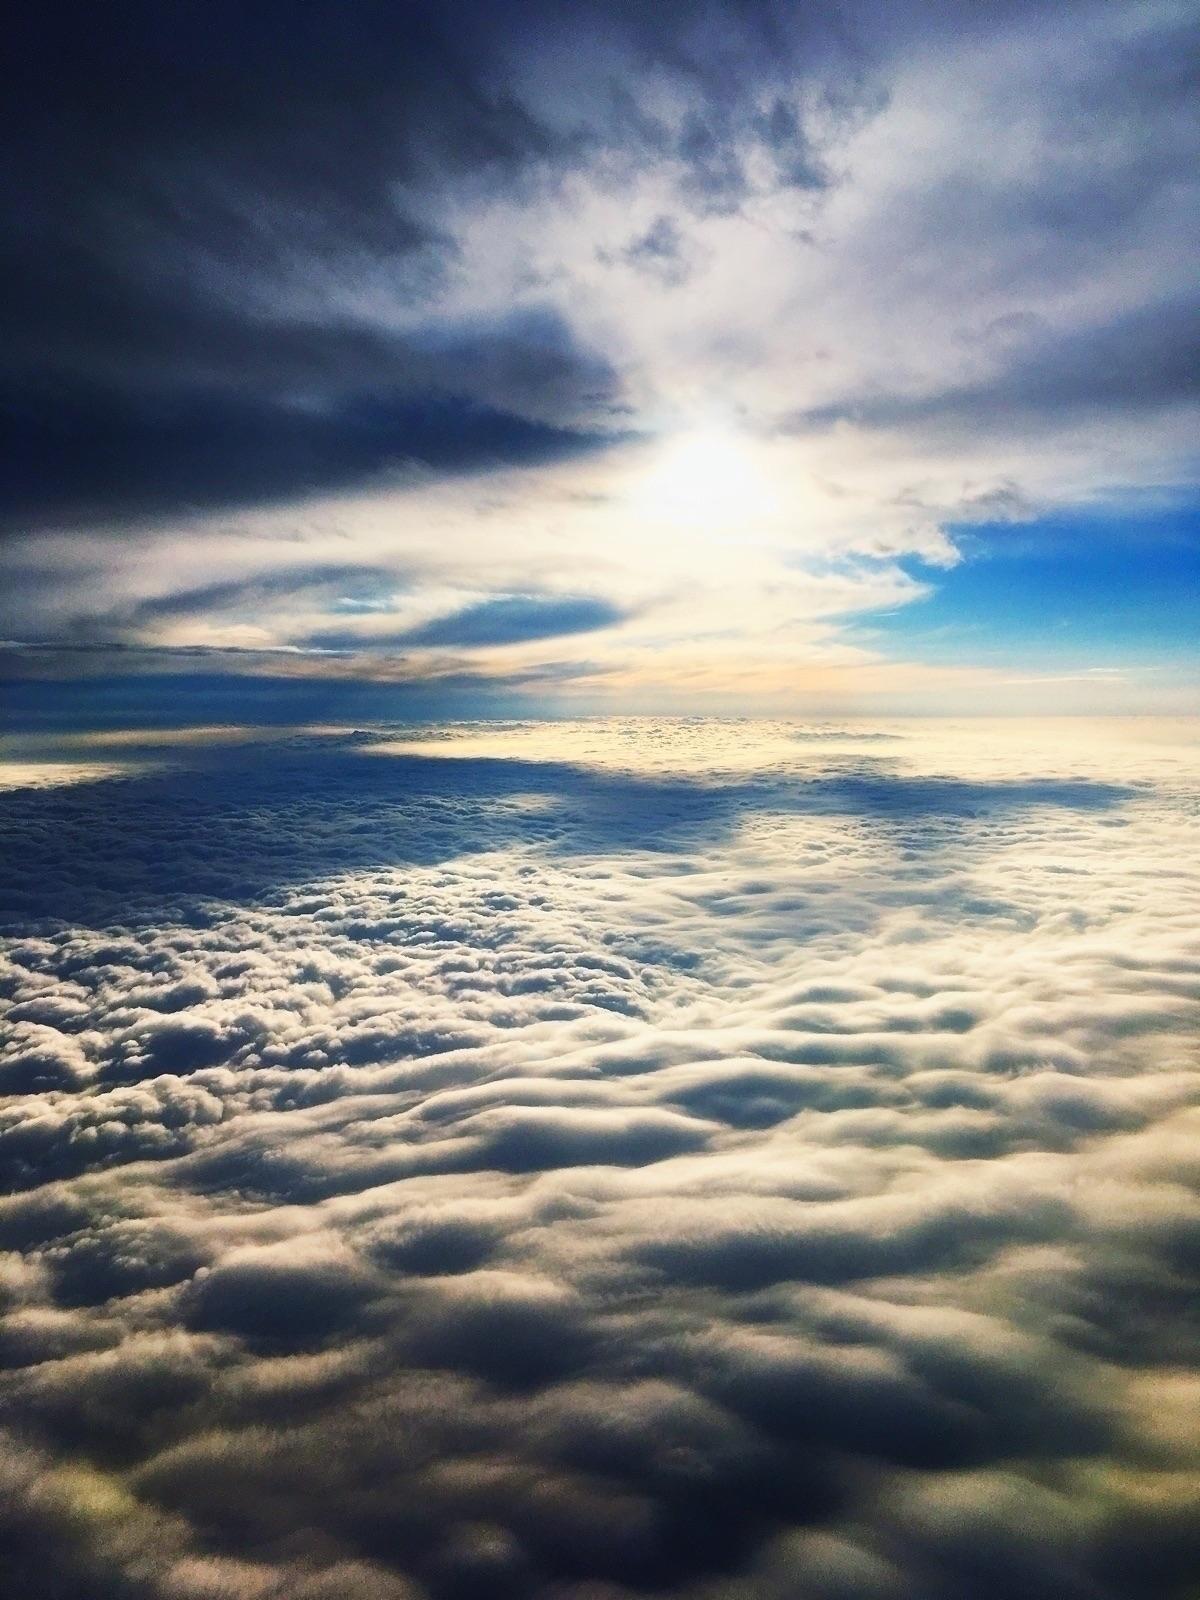 explore clouds - ShotoniPhone - sameagan | ello